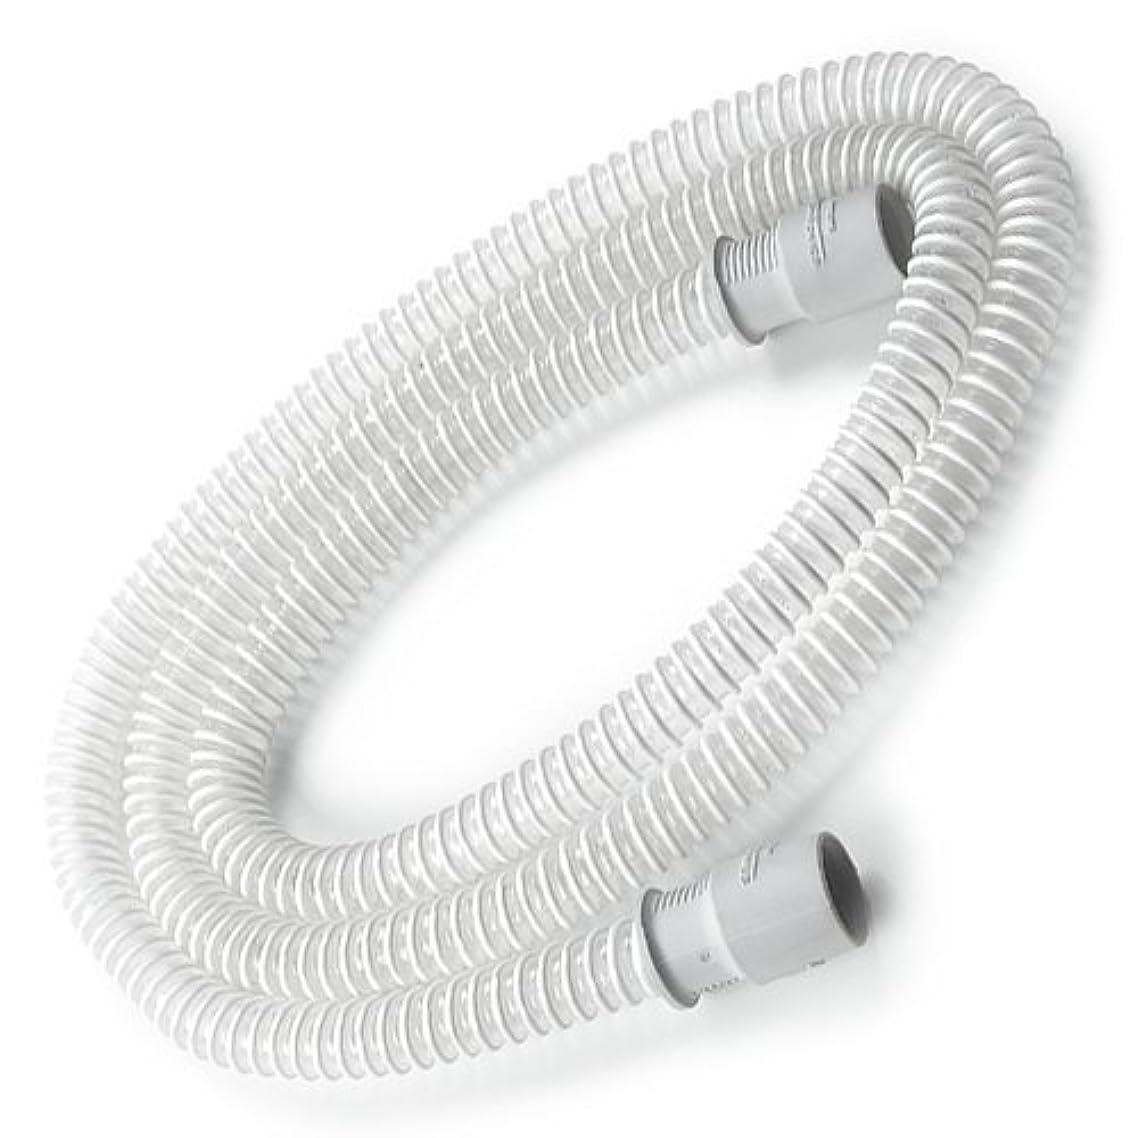 Standard Plastic Tubing for Philips Respironics DreamStation-15mm-PR15 , 6ft